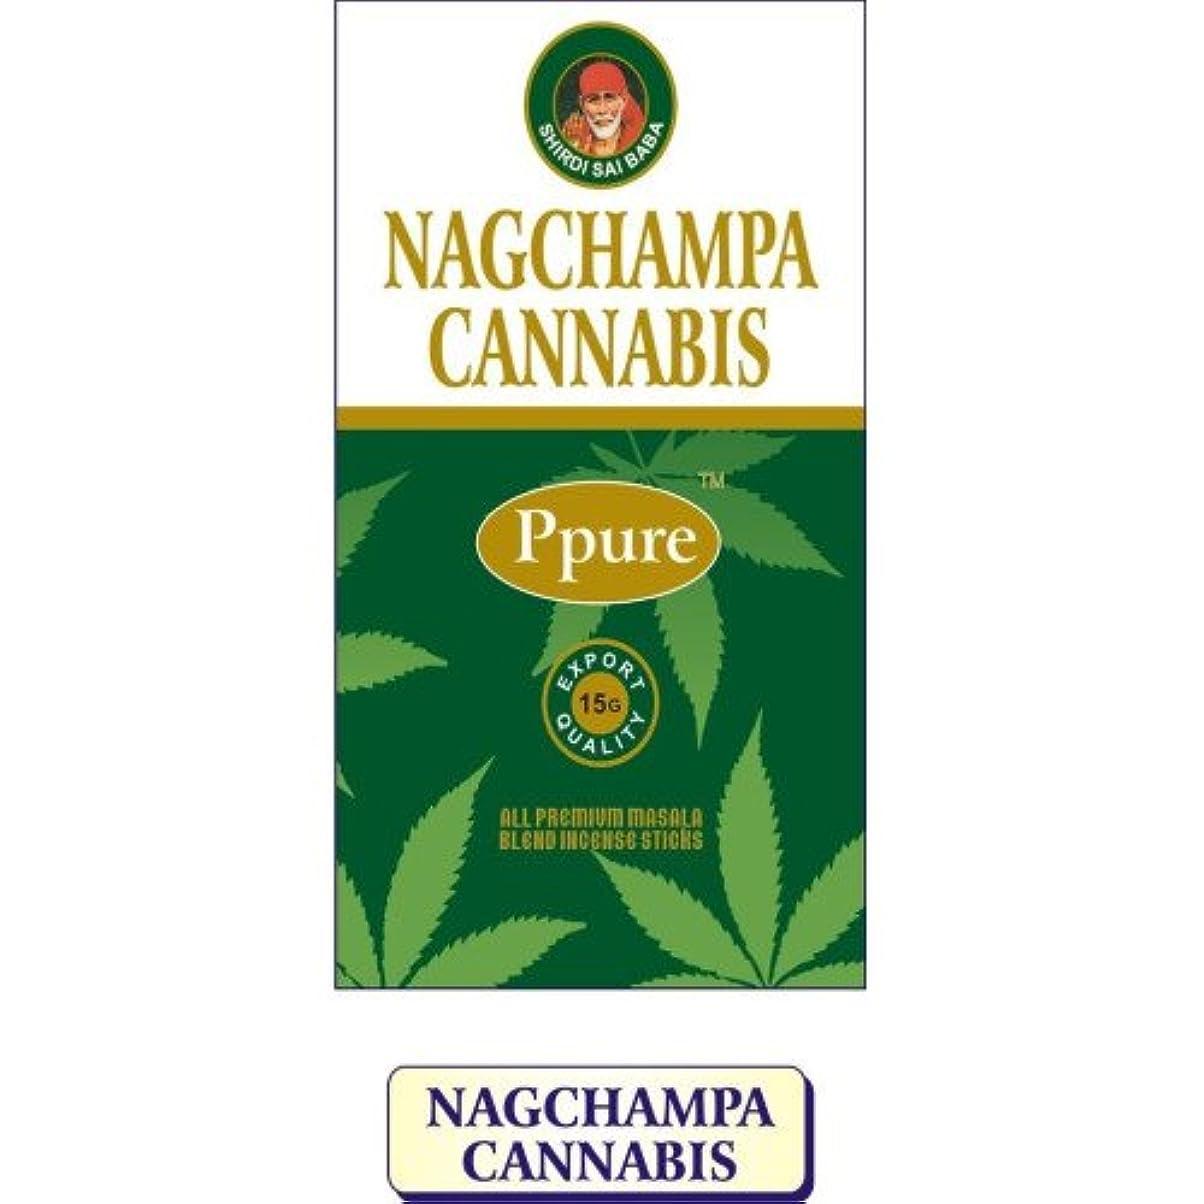 Ppure Nag Champa Cannabis PerfumeプレミアムMasala Incense Sticks 15グラム